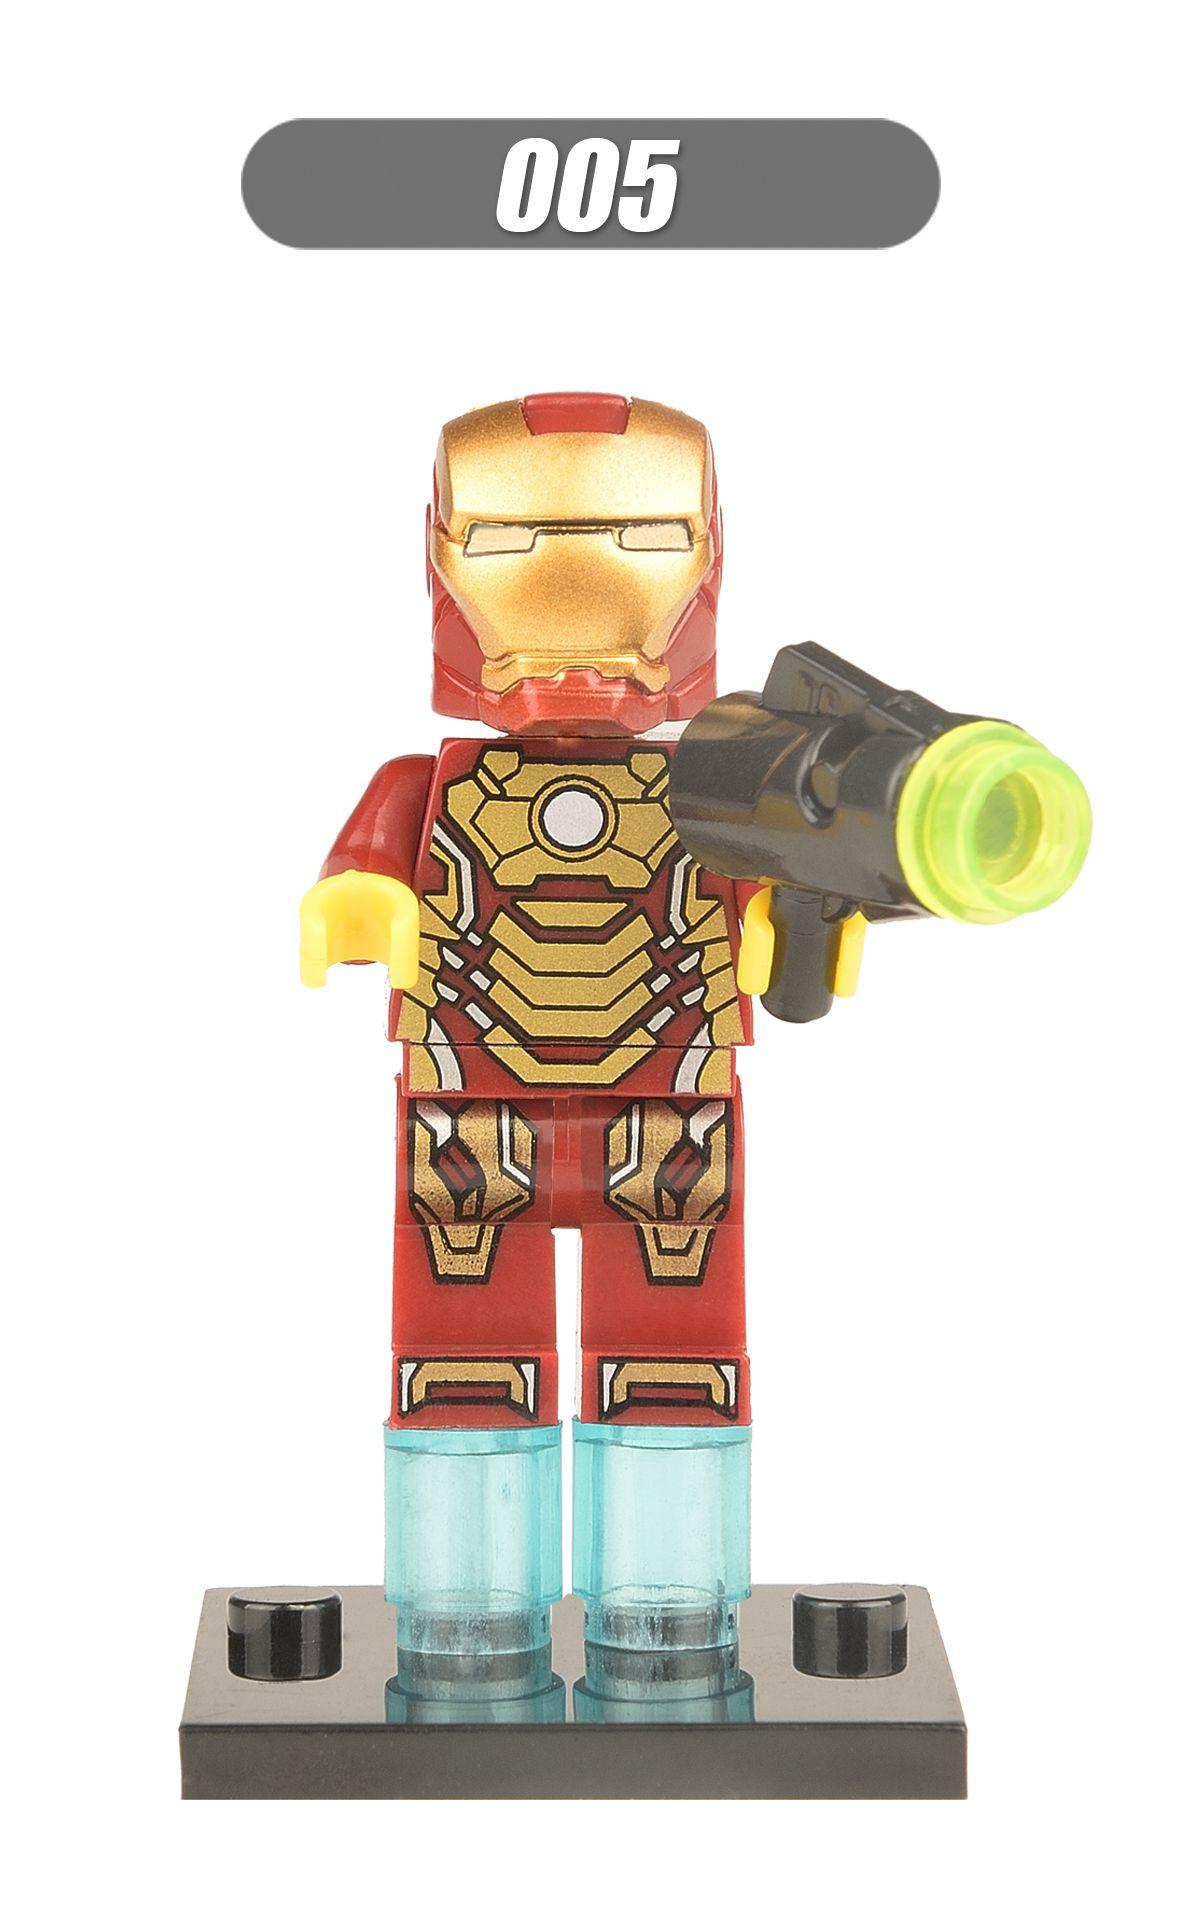 DHL Mini Super Heroes figure Hulk Batman Spiderman Wolverine Deadpool Robin Iron Man Thor Building Blocks Toys